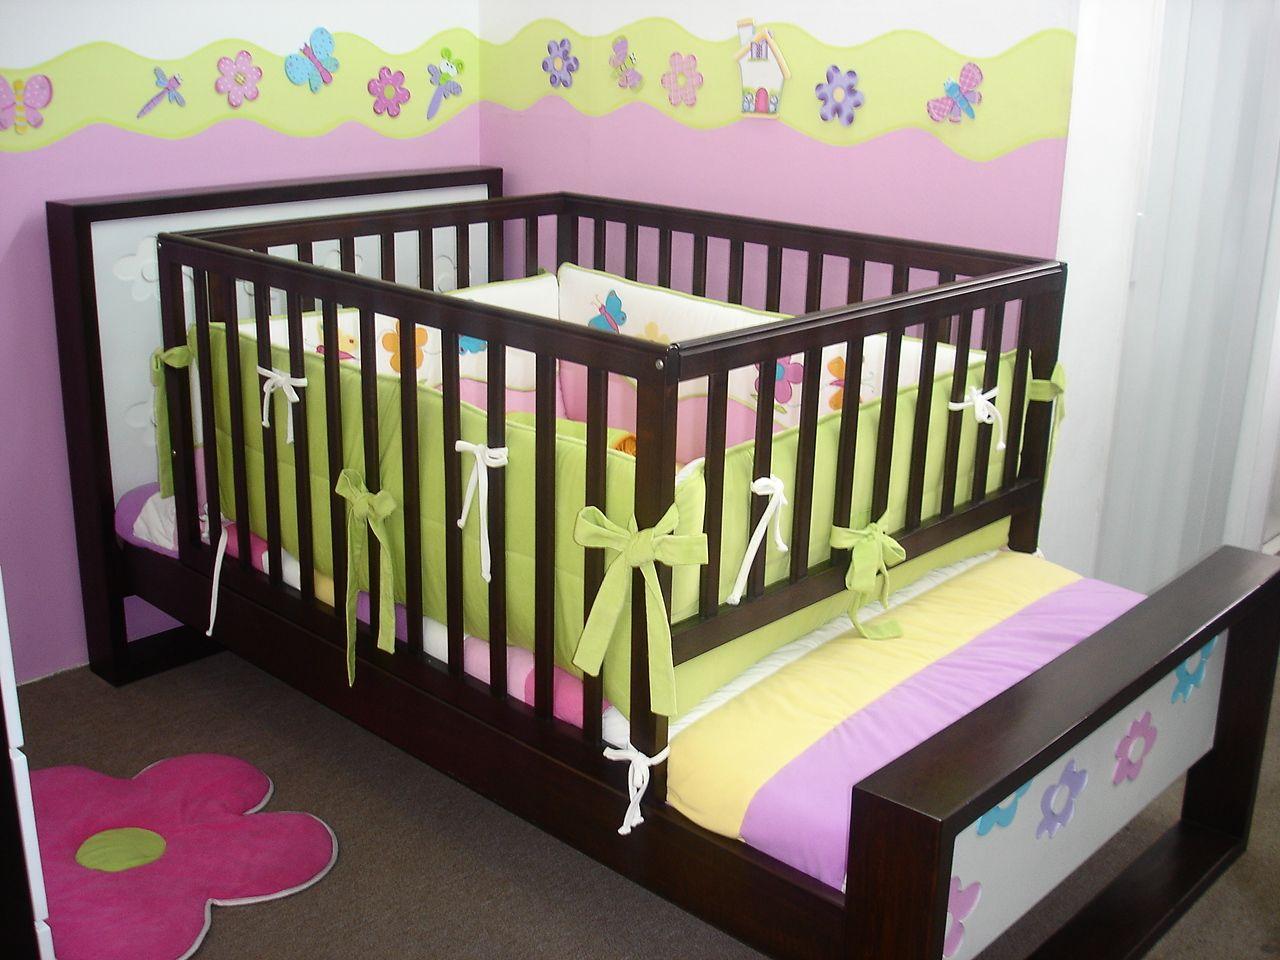 Corral para cama beb pinterest camas bebe y for Cama cuna para nina